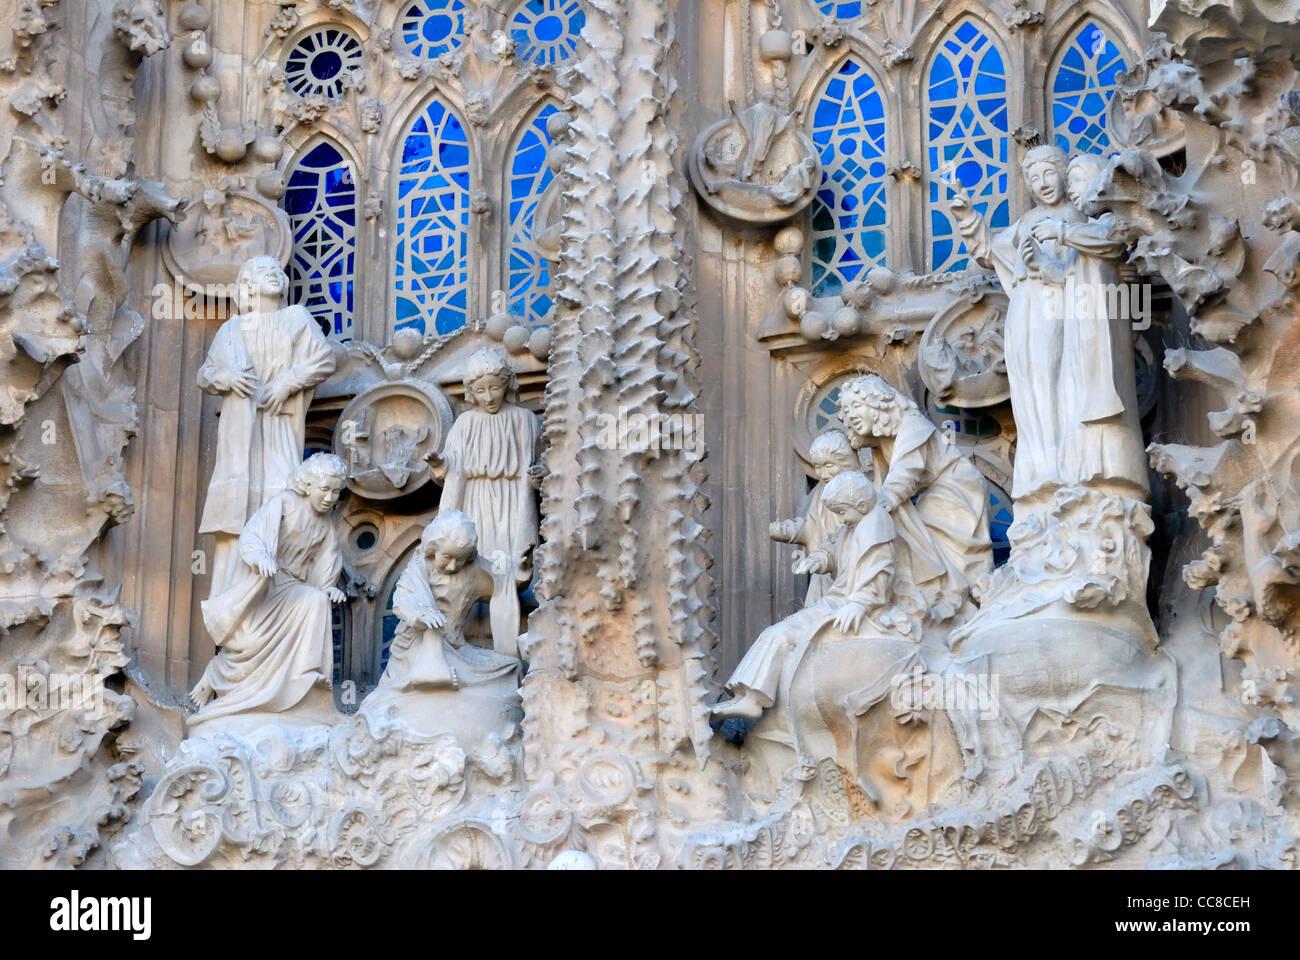 Temple De La Sagrada Familia (Antoni Gaudi; Begun 1882, Still Unfinished)  Detail Of Eastern Or Nativity Facade